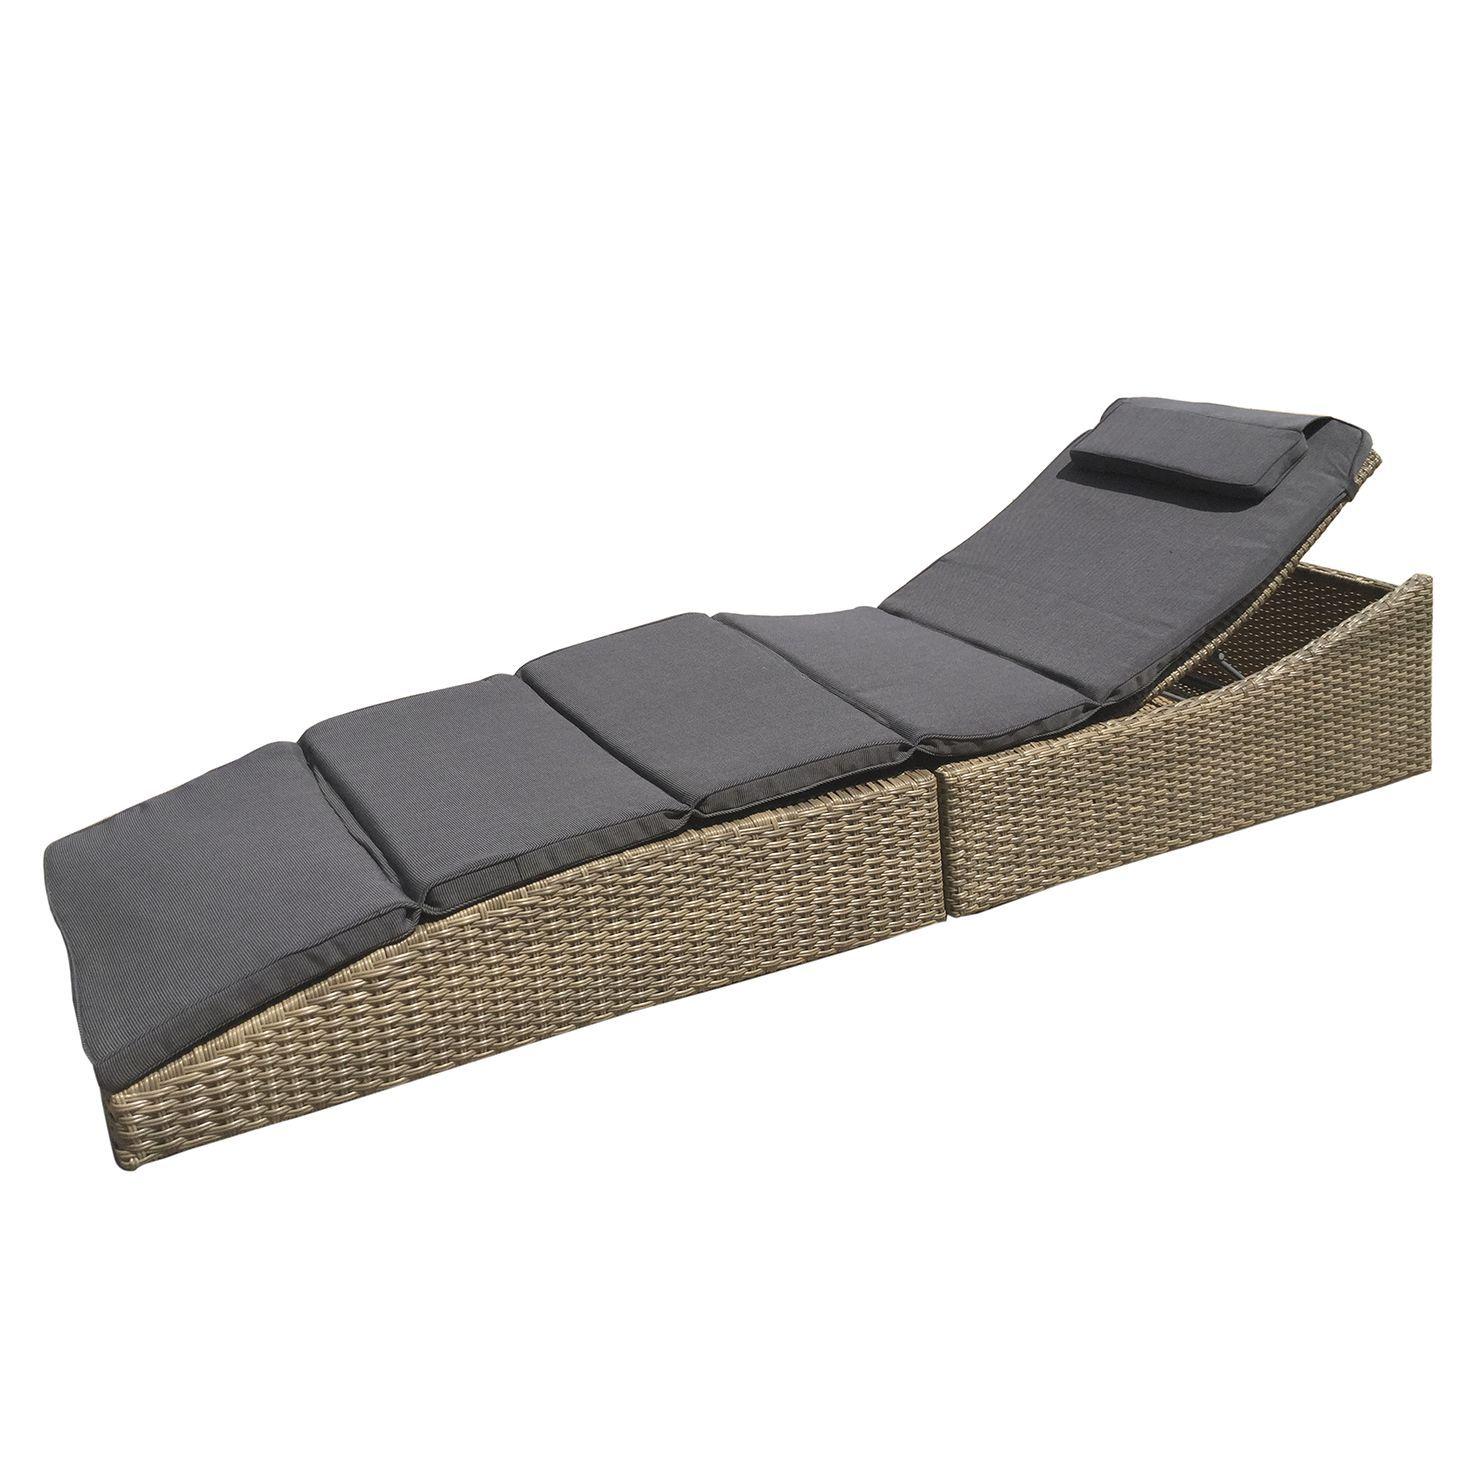 Gartenliege Villebon Outdoor Decor Outdoor Furniture Outdoor Sofa